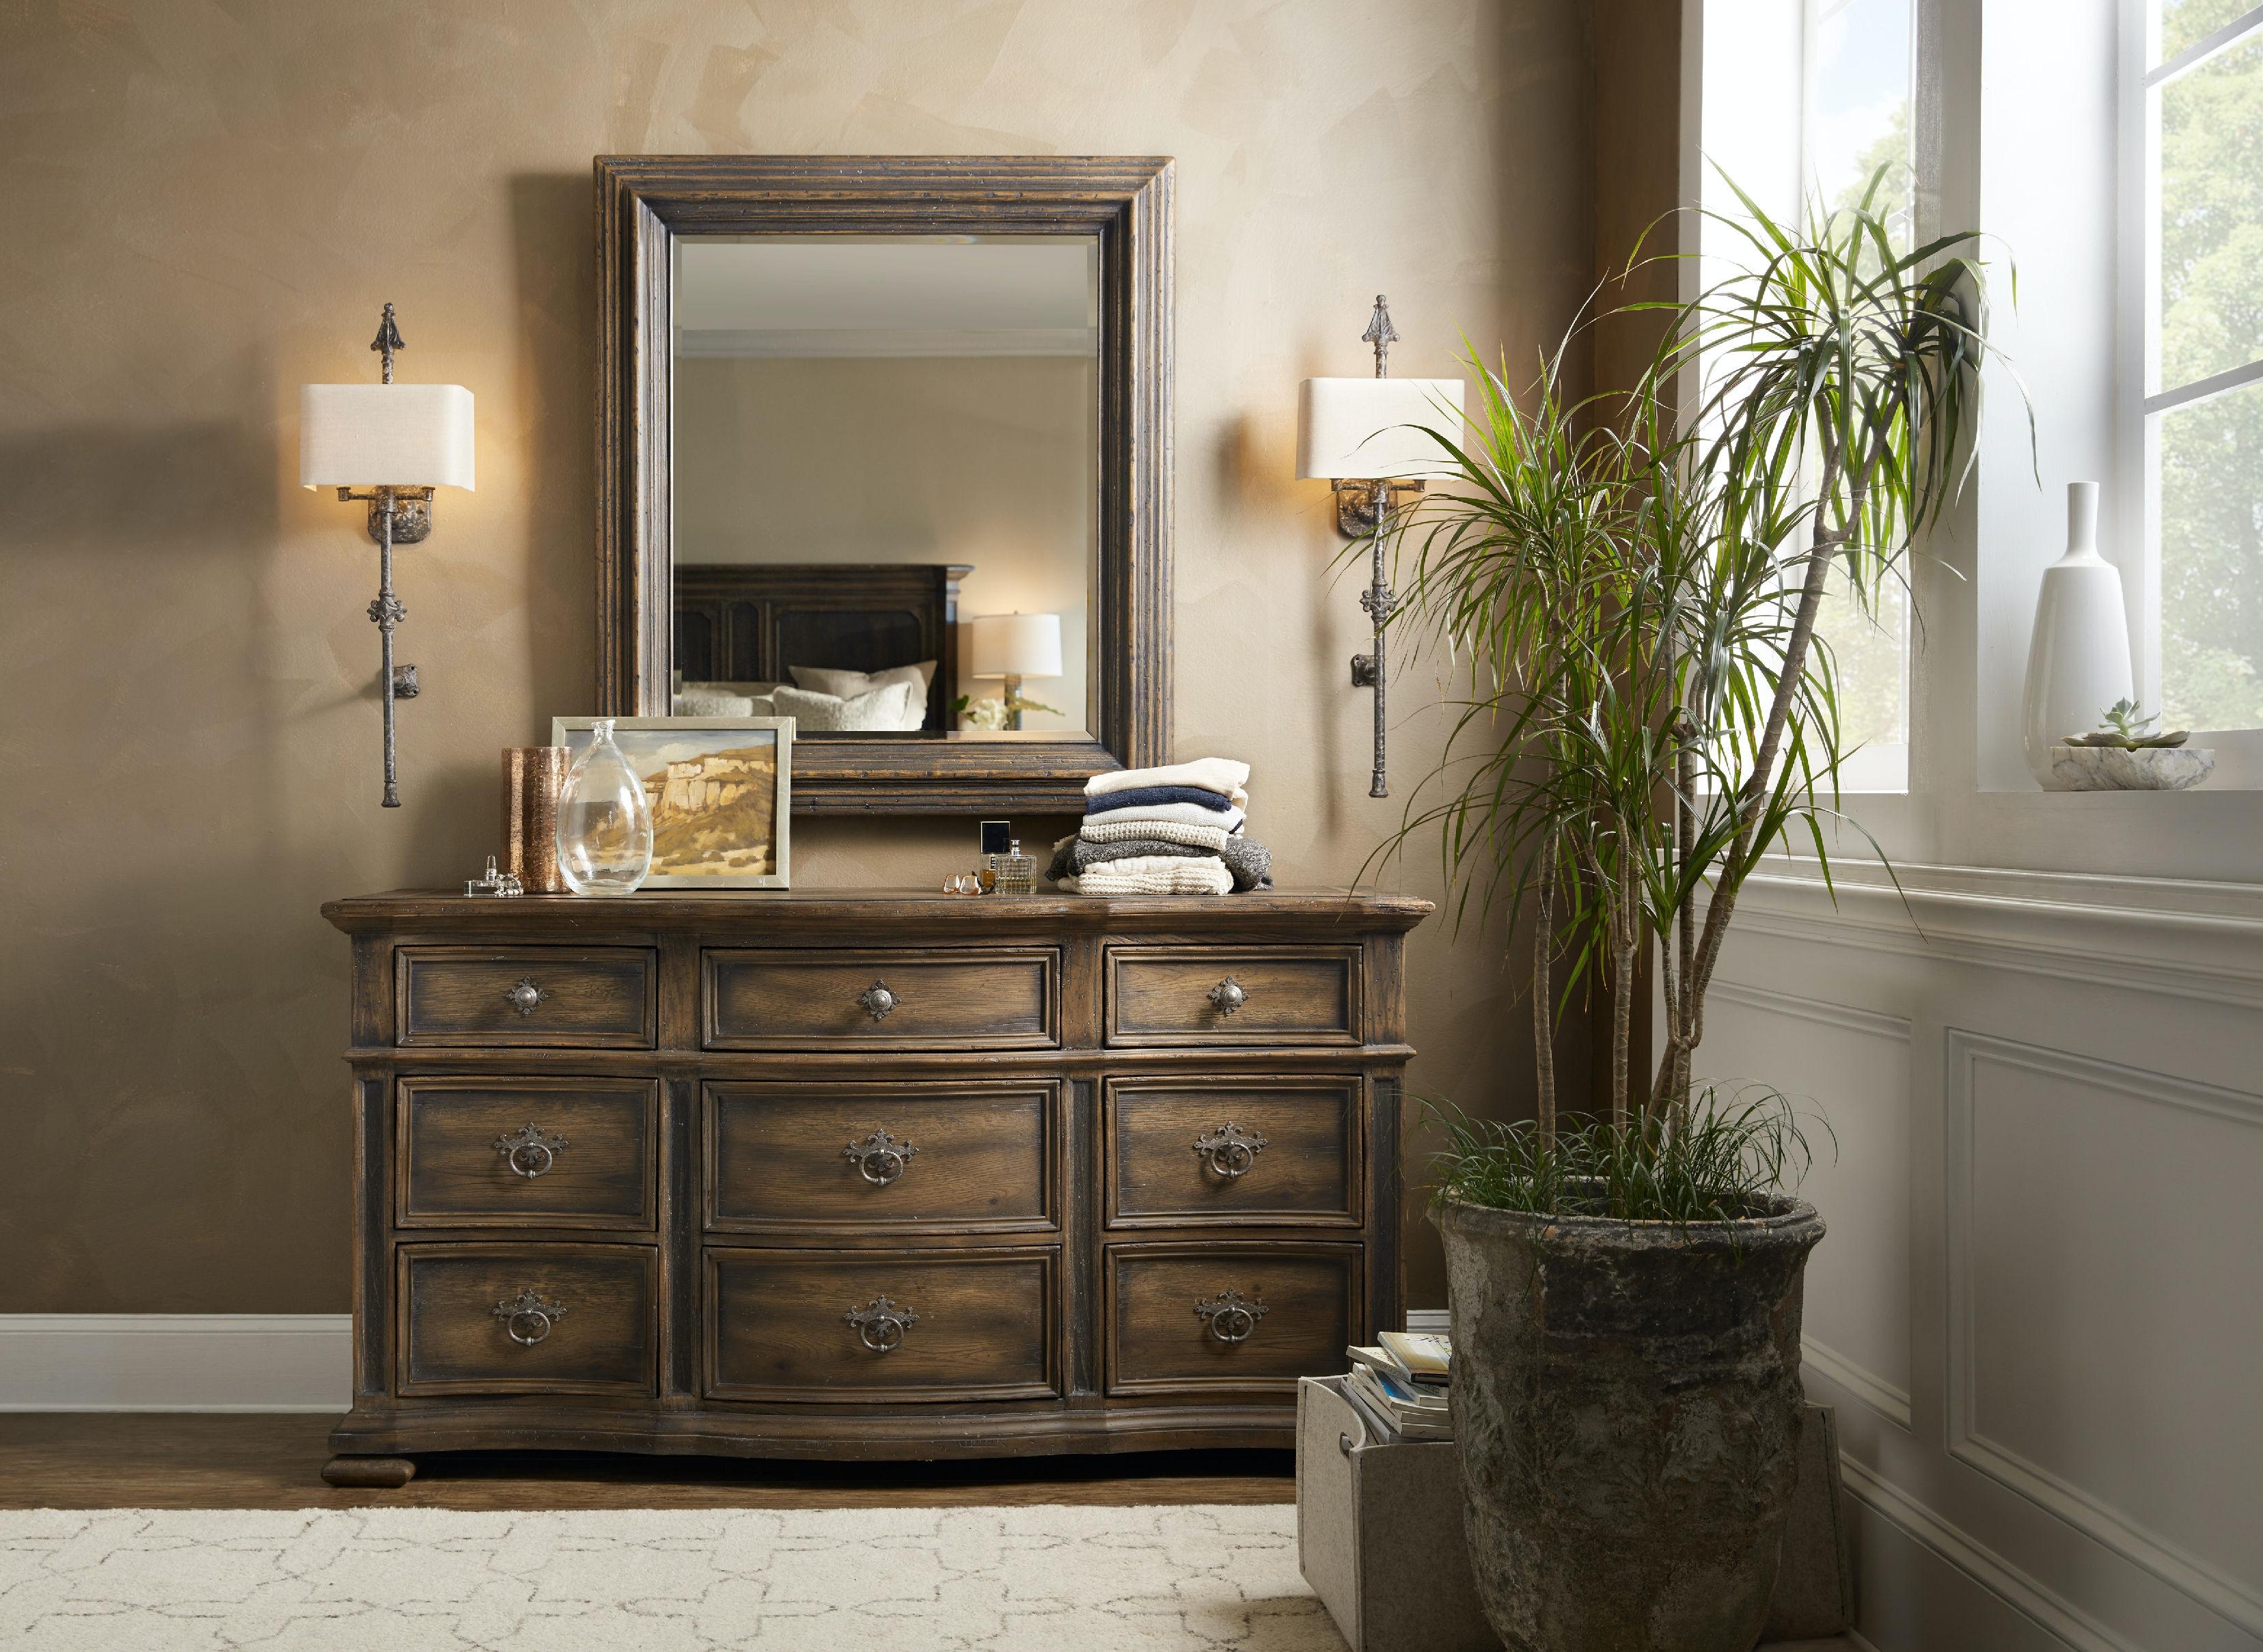 Hooker Furniture Mico Mirror 5960 90004 BLK